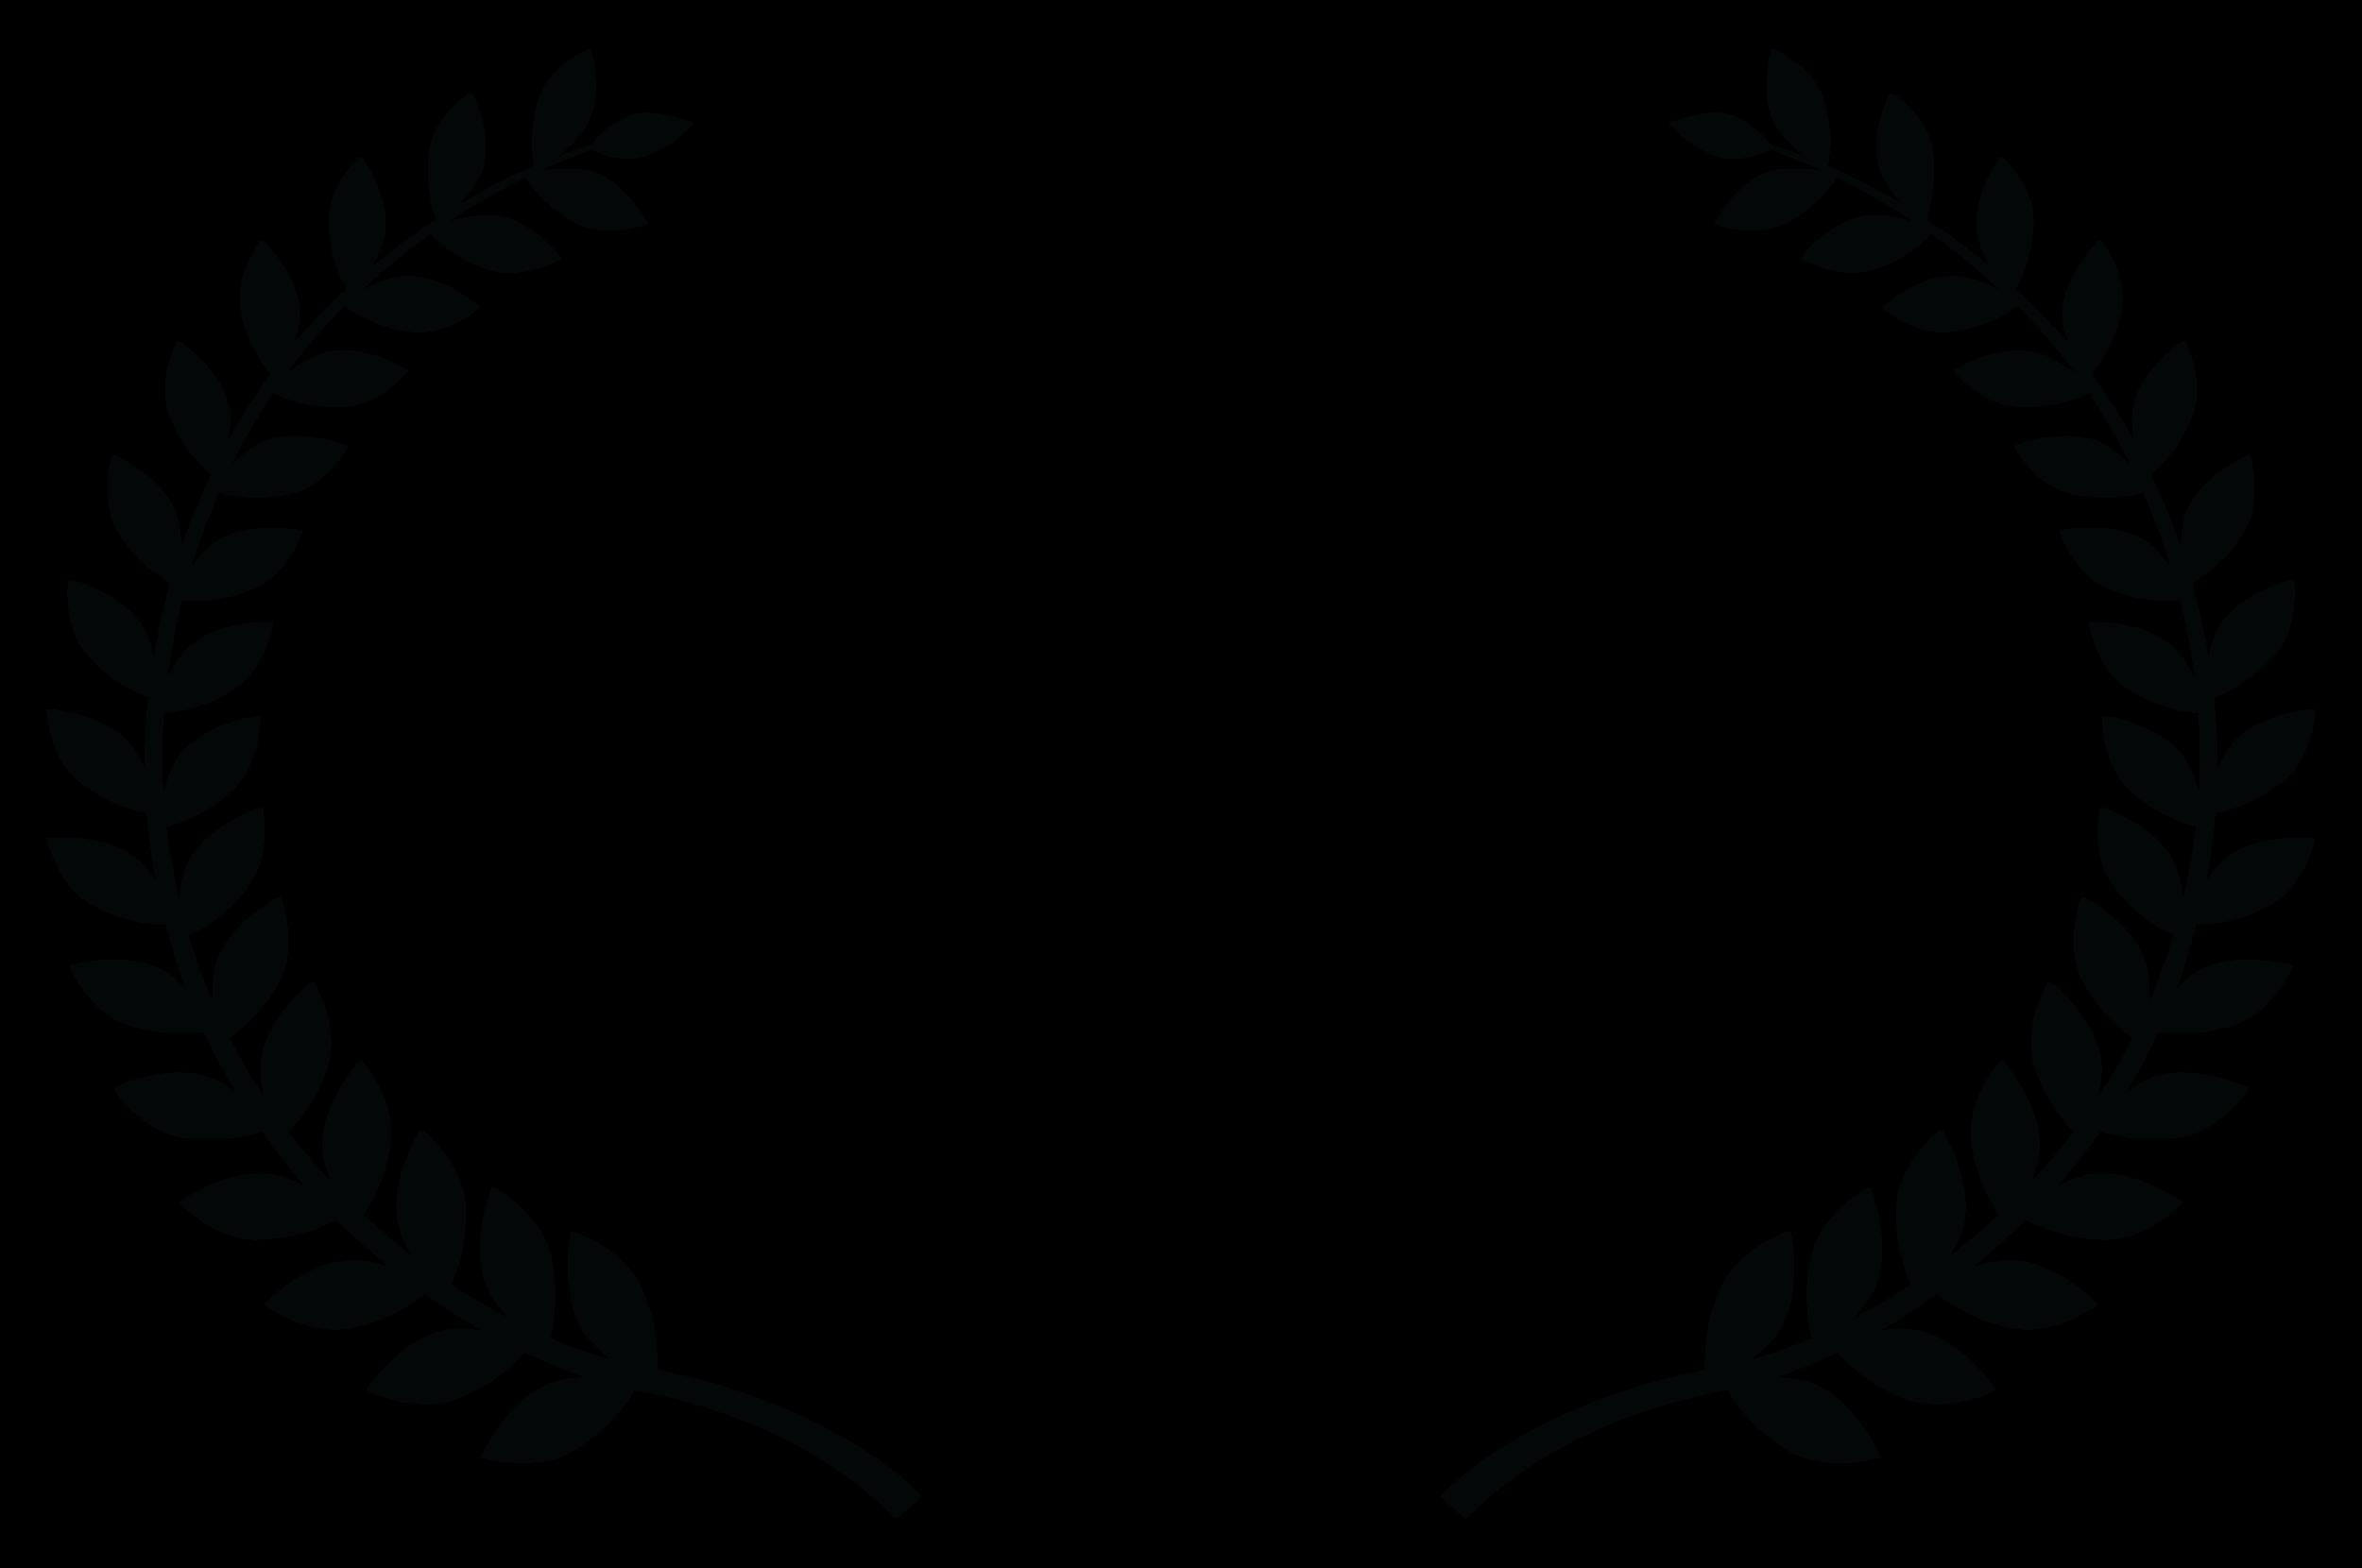 OFFICIALSELECTION-OkotoksFilmFestival-2018.png